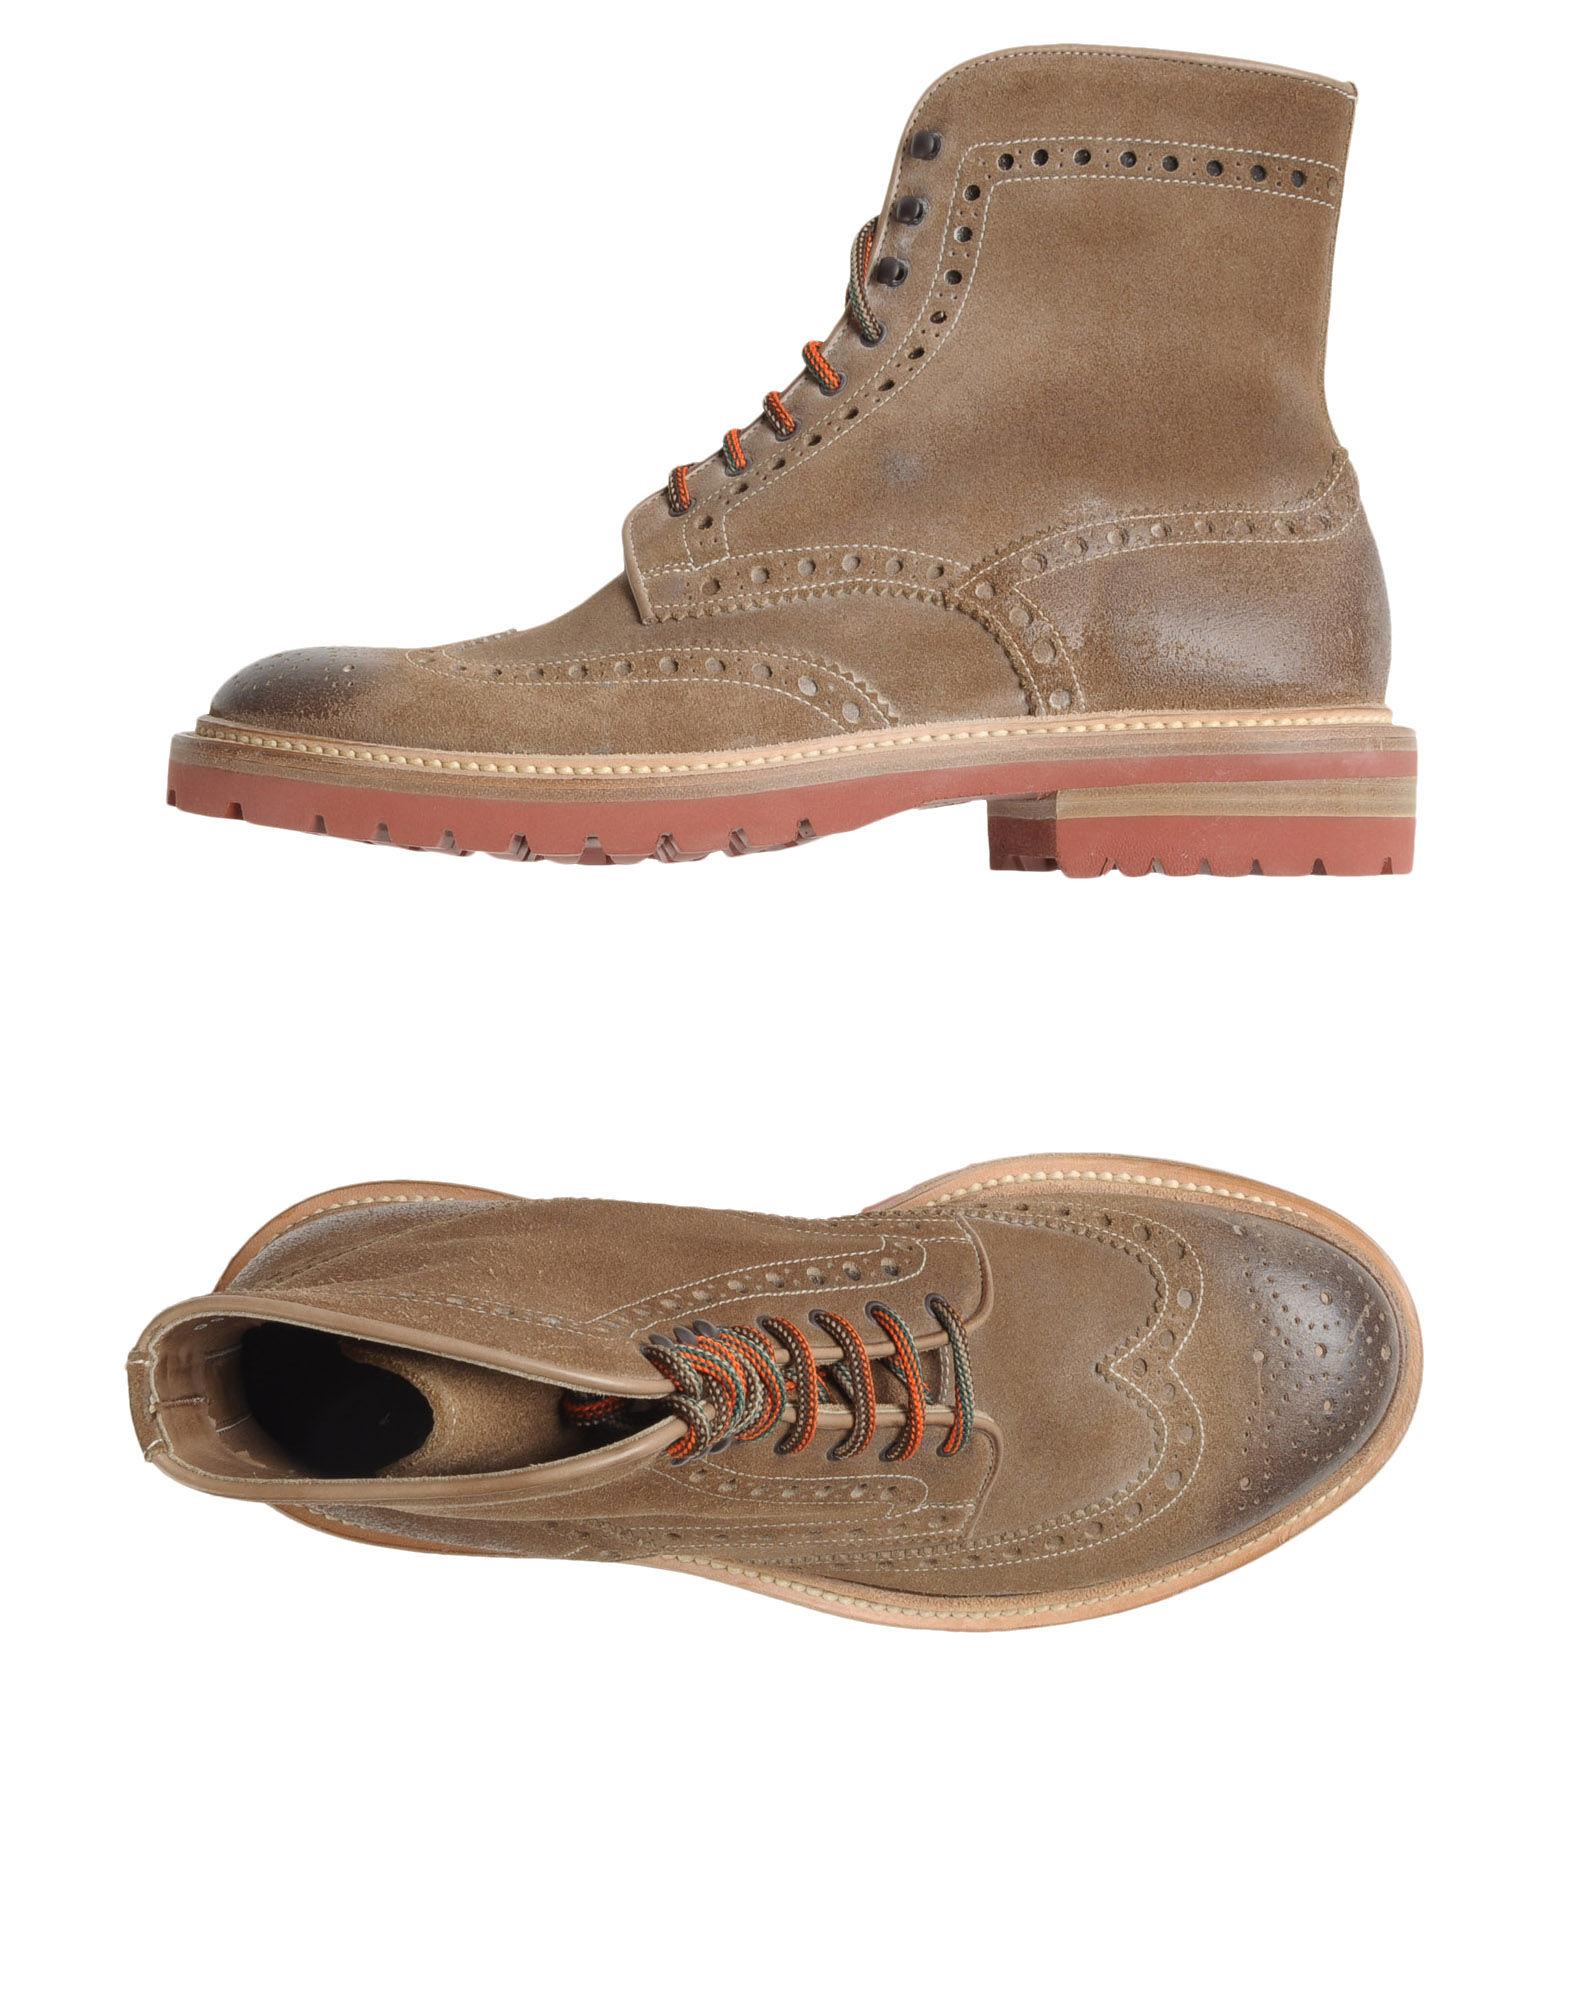 santoni sizing shoes vs boots styleforum. Black Bedroom Furniture Sets. Home Design Ideas